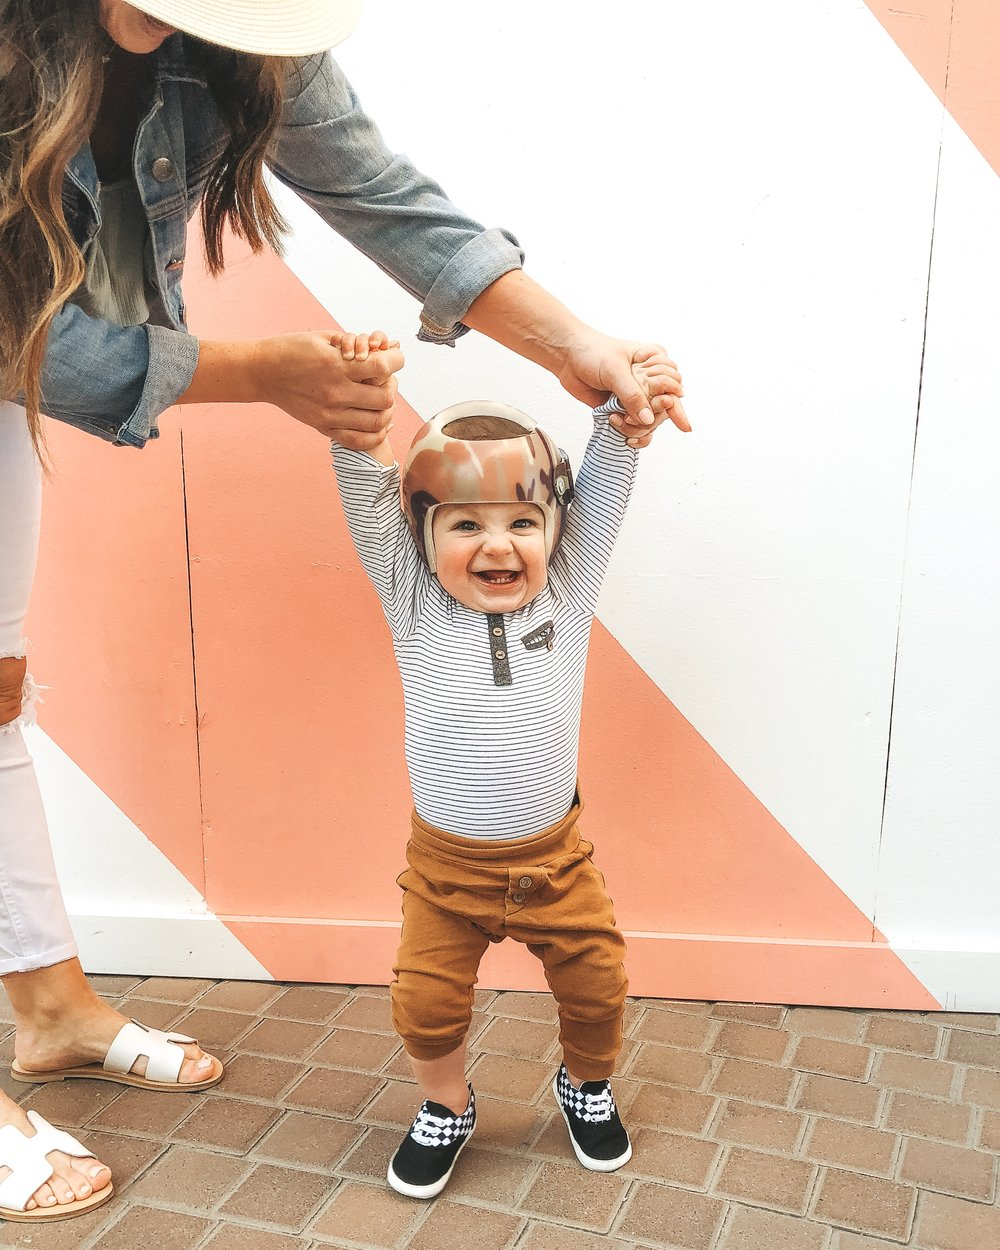 Jett Jones 11 Month Milestones. Cute baby boy clothes. Vans crib shoes for baby boy.